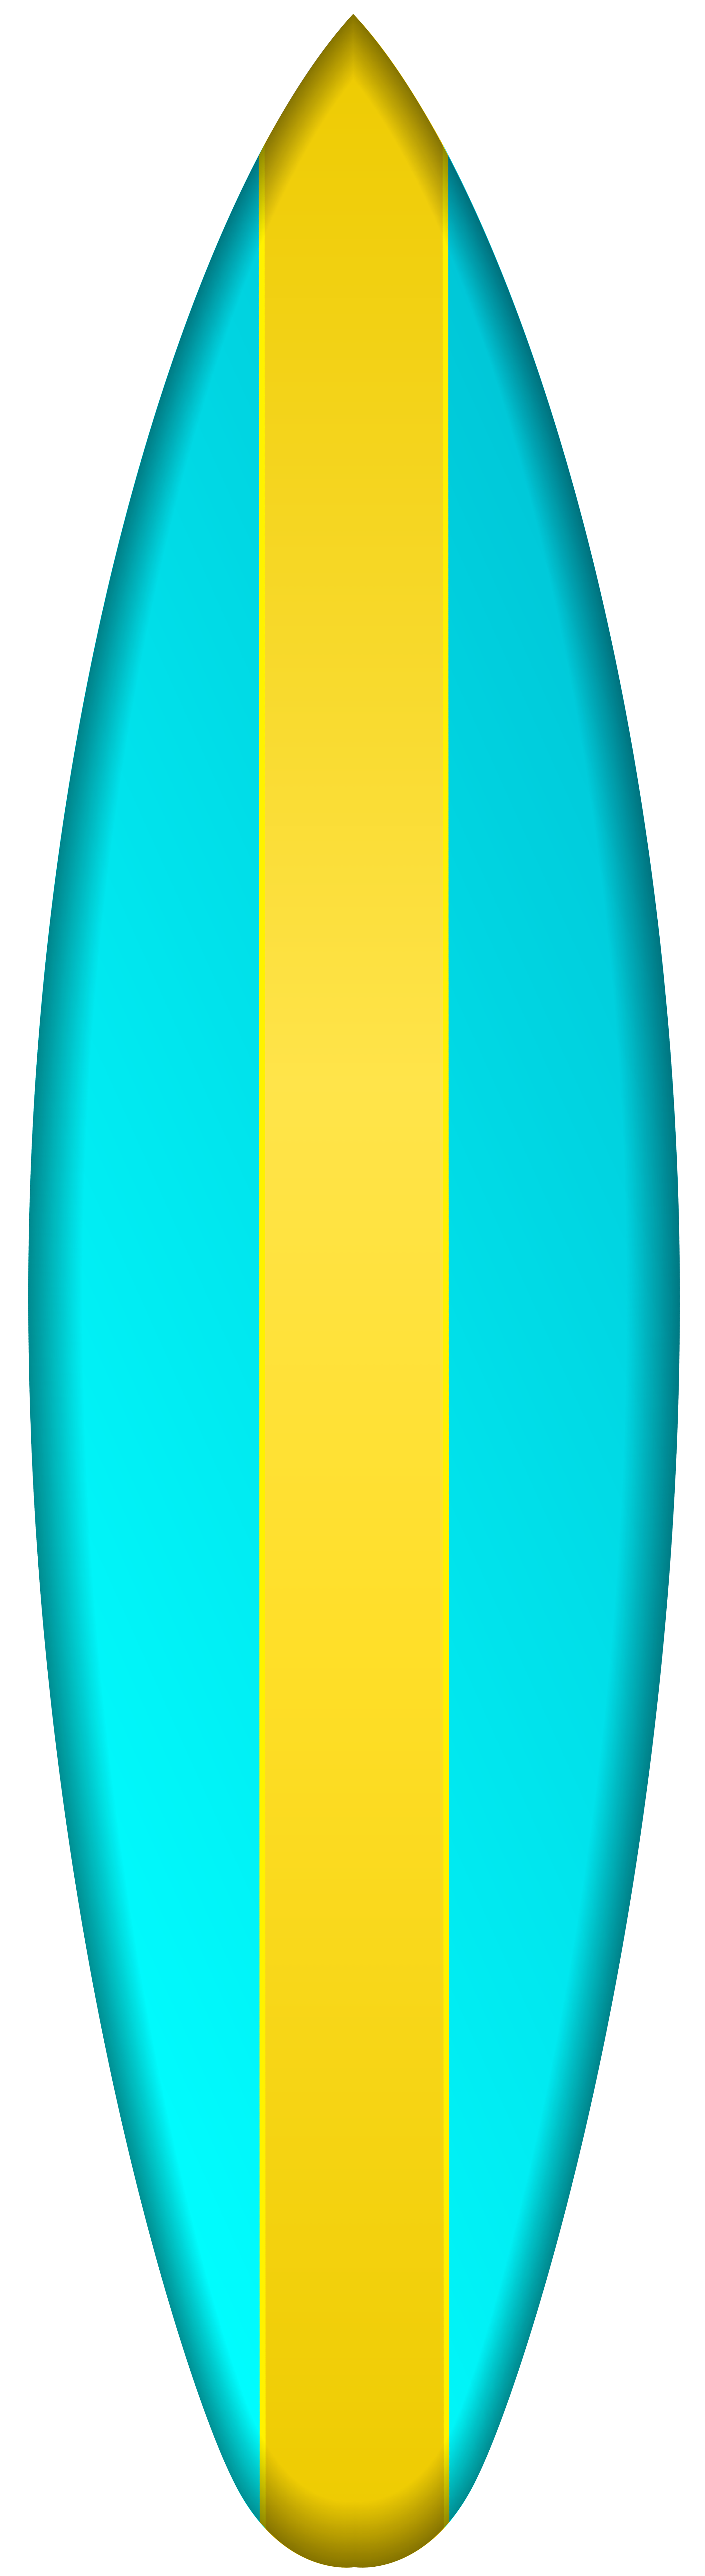 Clipart wave surfboard. Transparent background image group